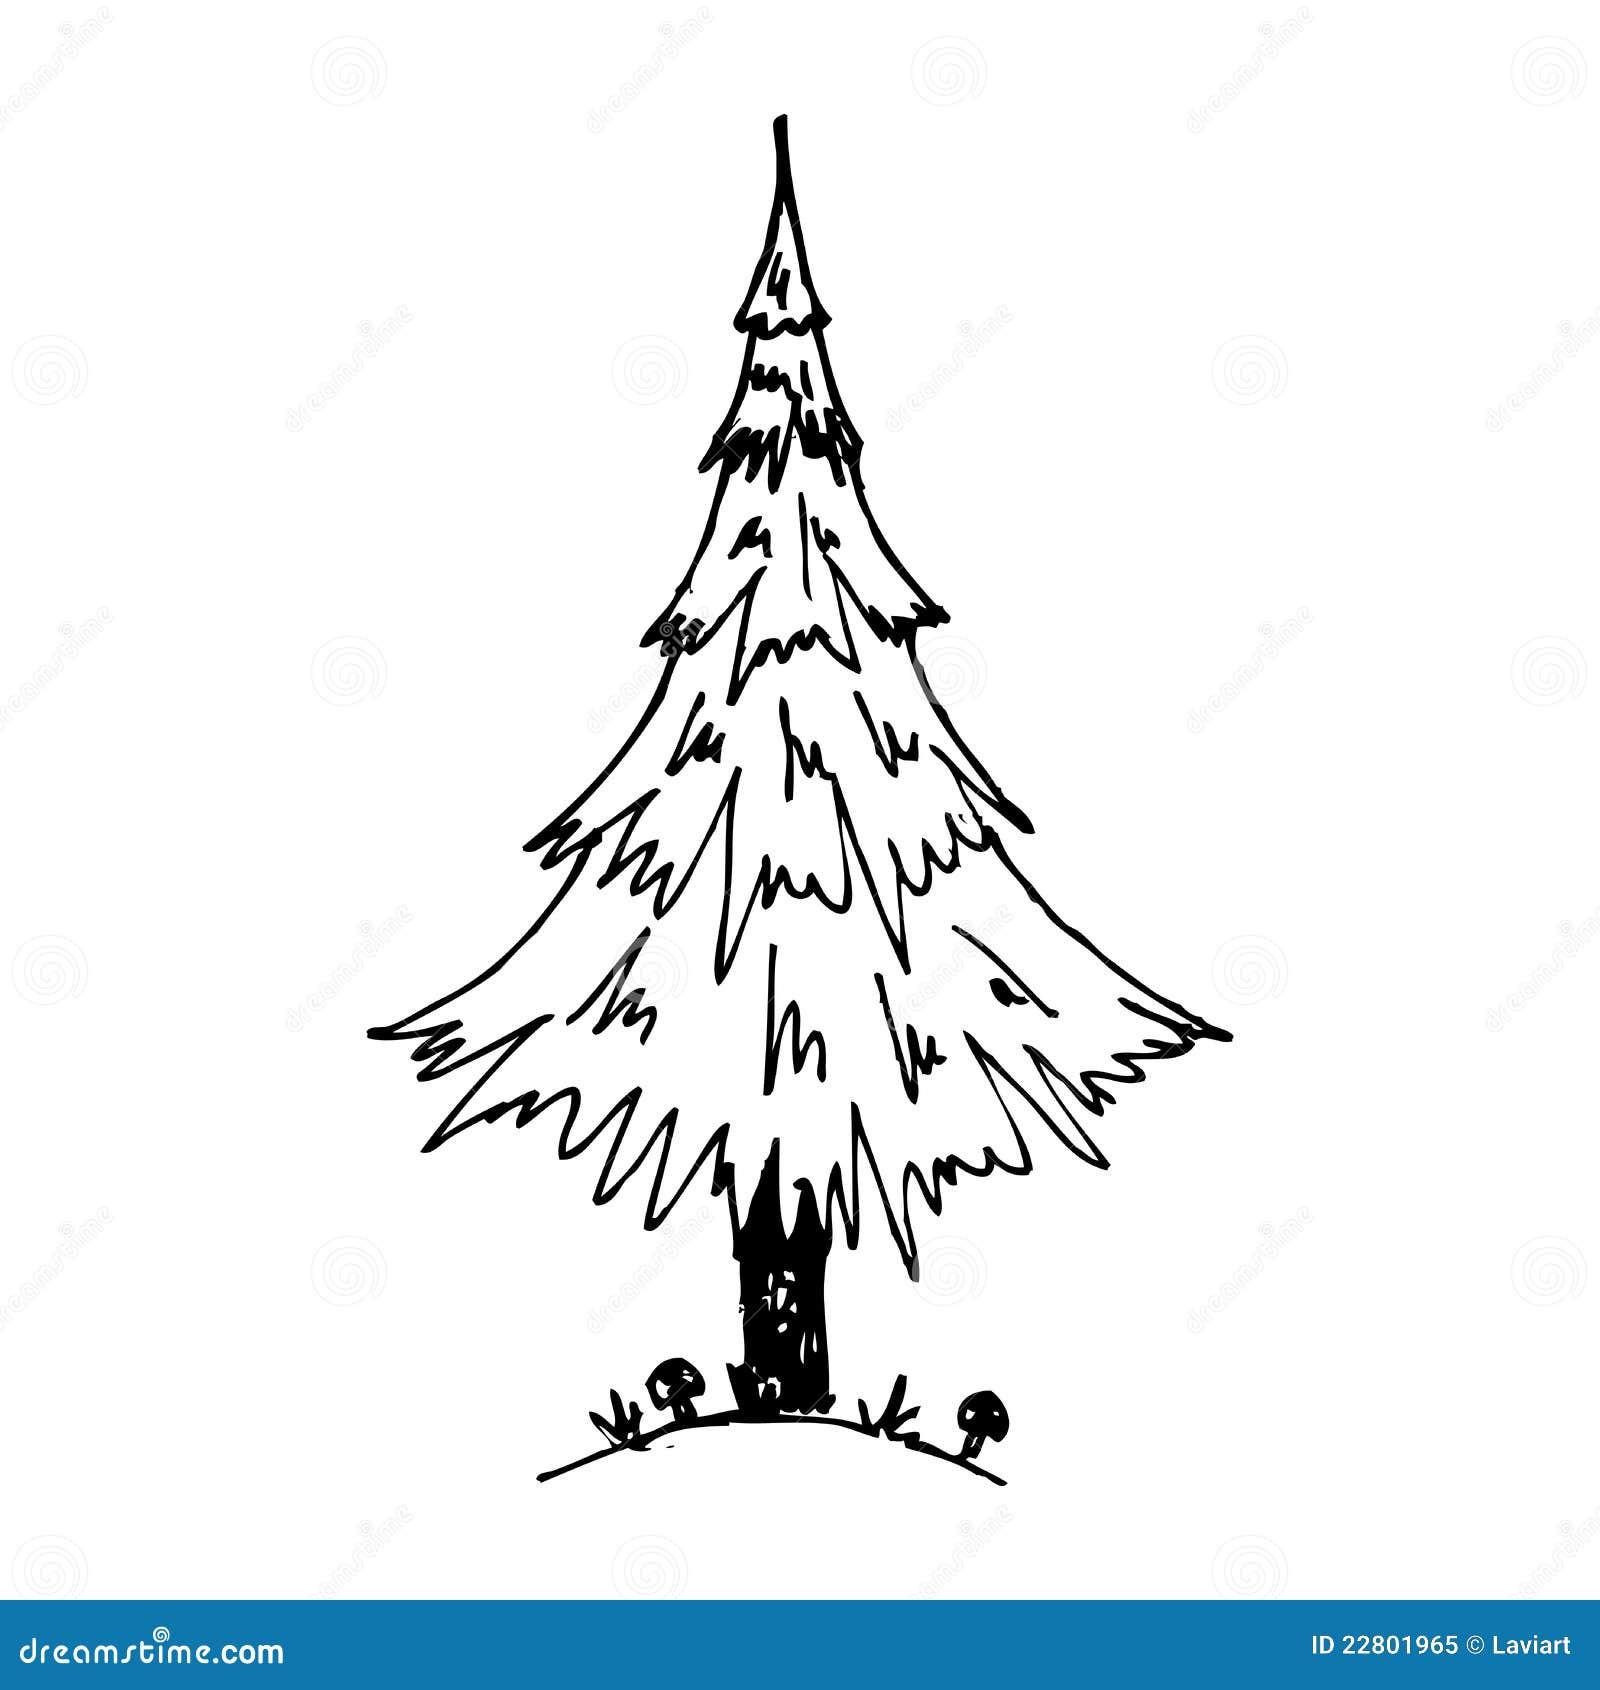 Pine Tree Royalty Free Stock Photo Image 22801965